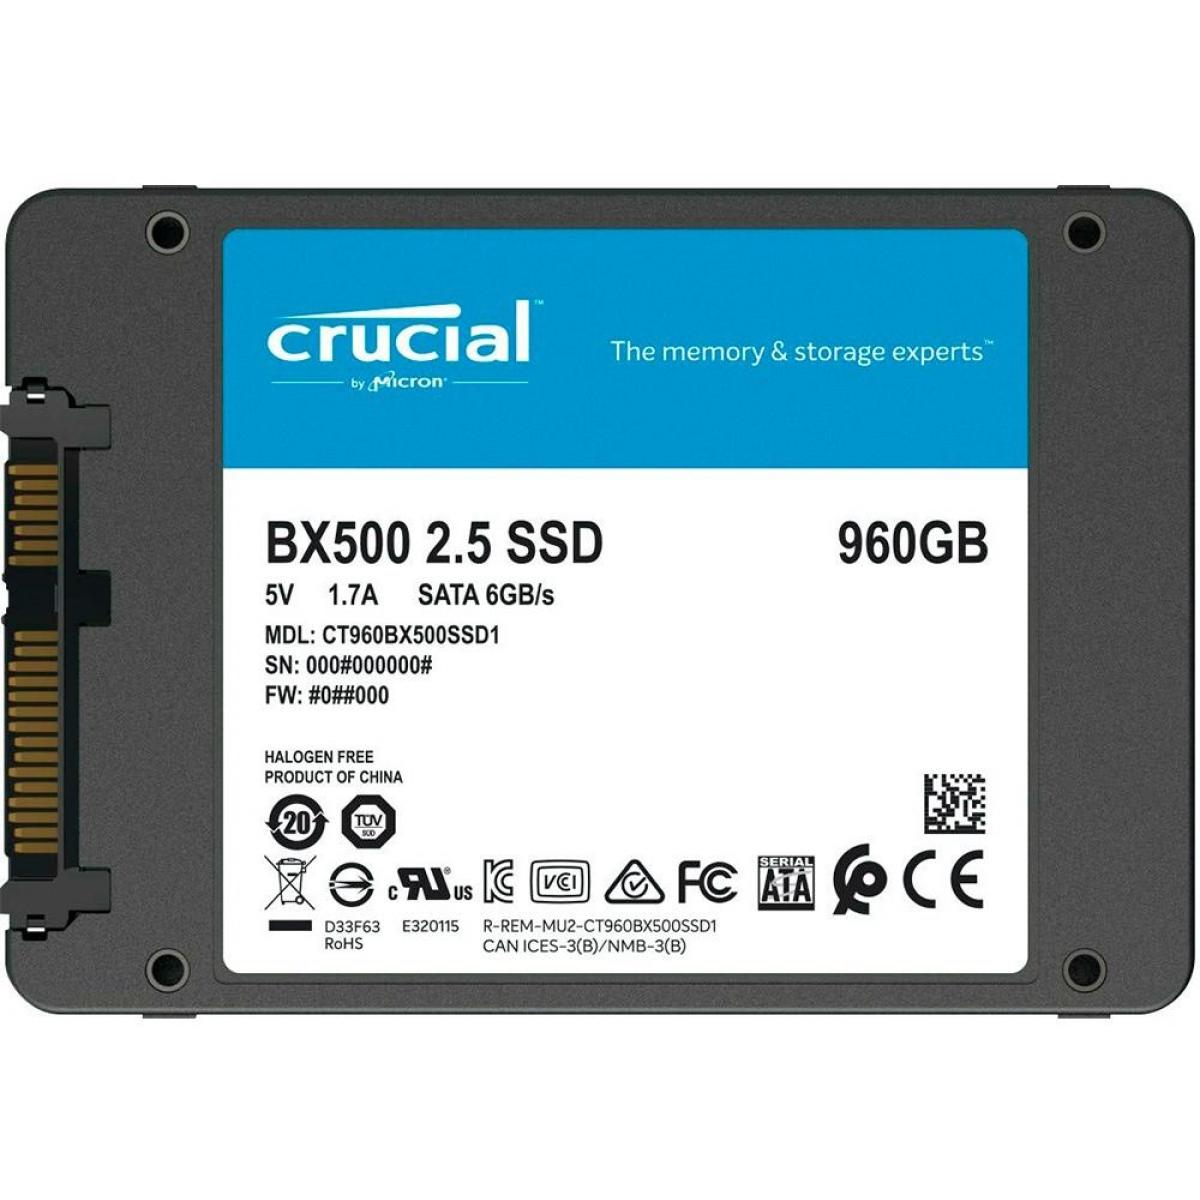 SSD Crucial BX500, 960GB, Sata III, Leitura 540MBs Gravação 500MBs, CT960BX500SSD1